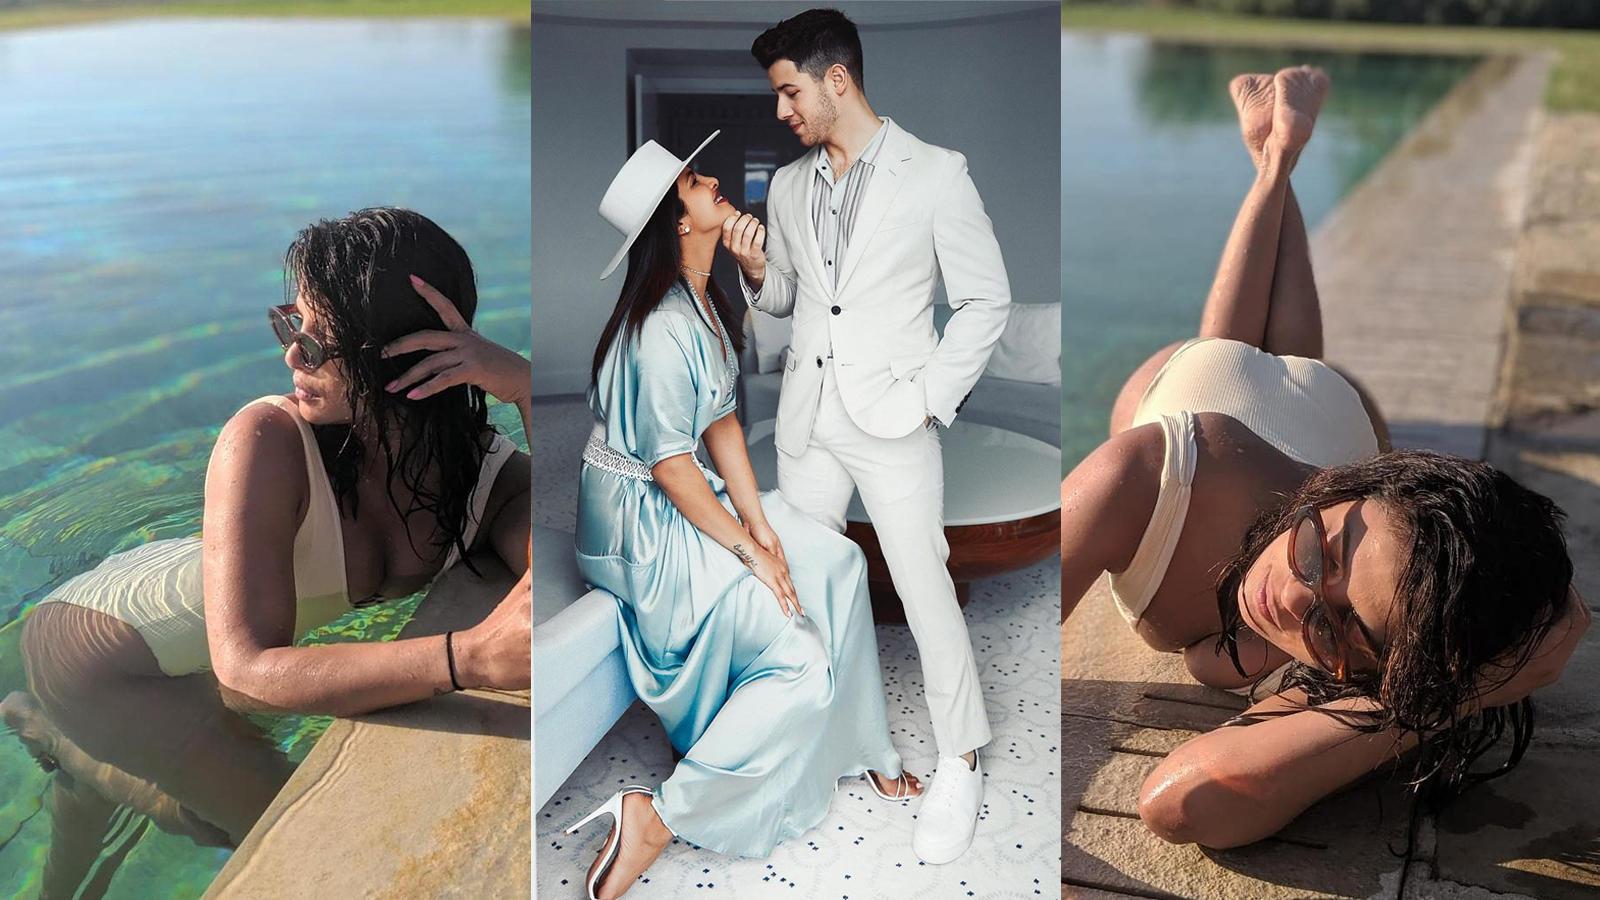 Priyanka Chopra talks about doing a Bollywood film with husband Nick Jonas, says he first needs to learn Hindi